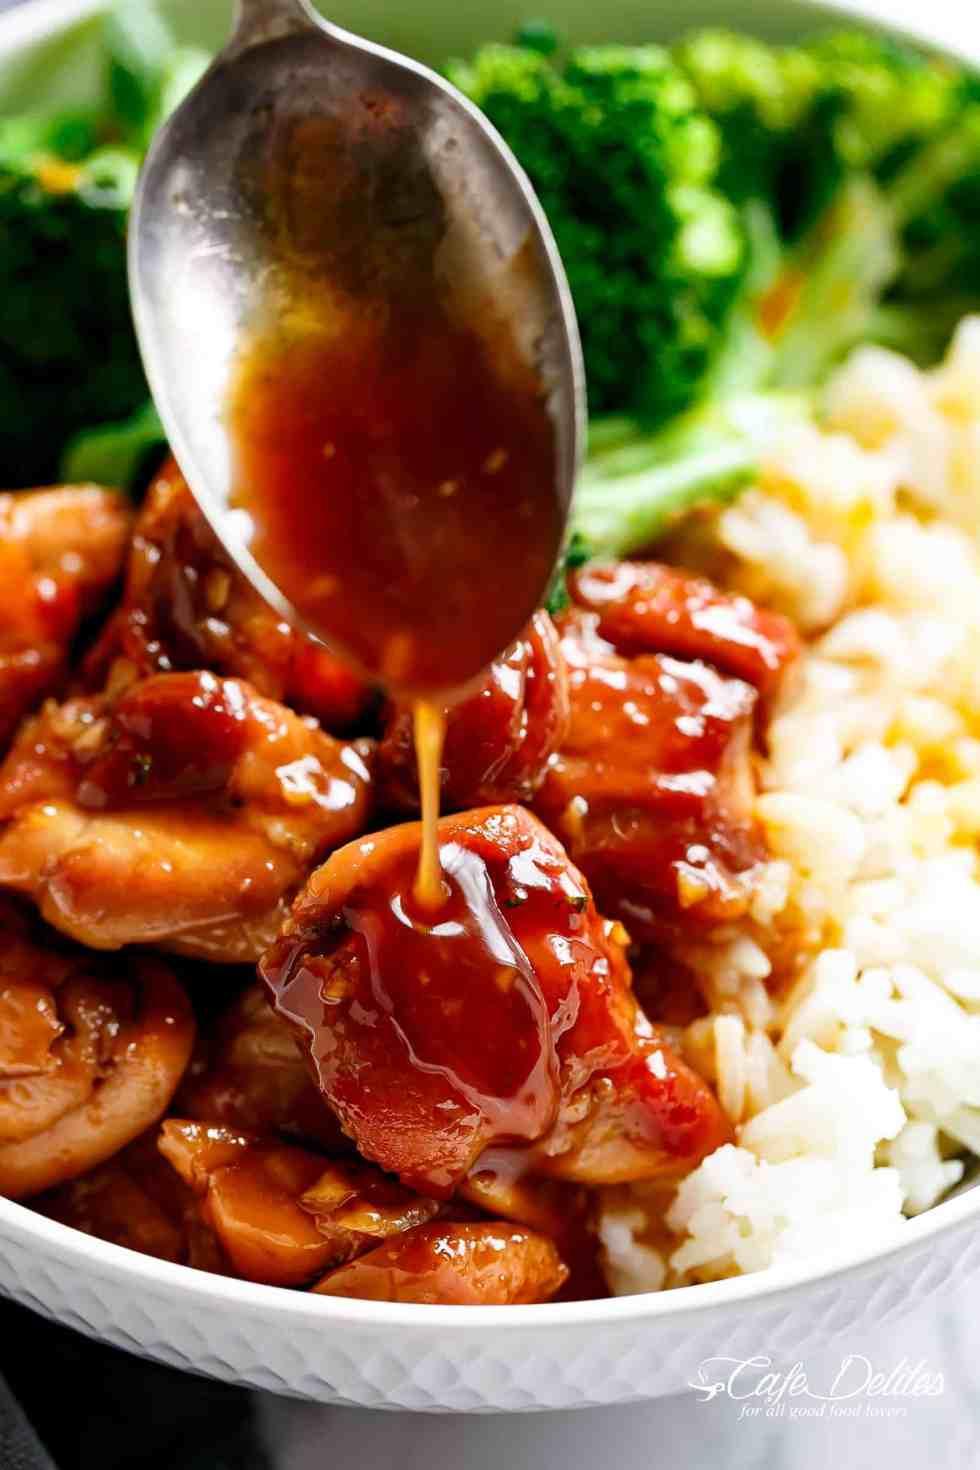 Best Homemade Teriyaki Sauce | cafedelites.com